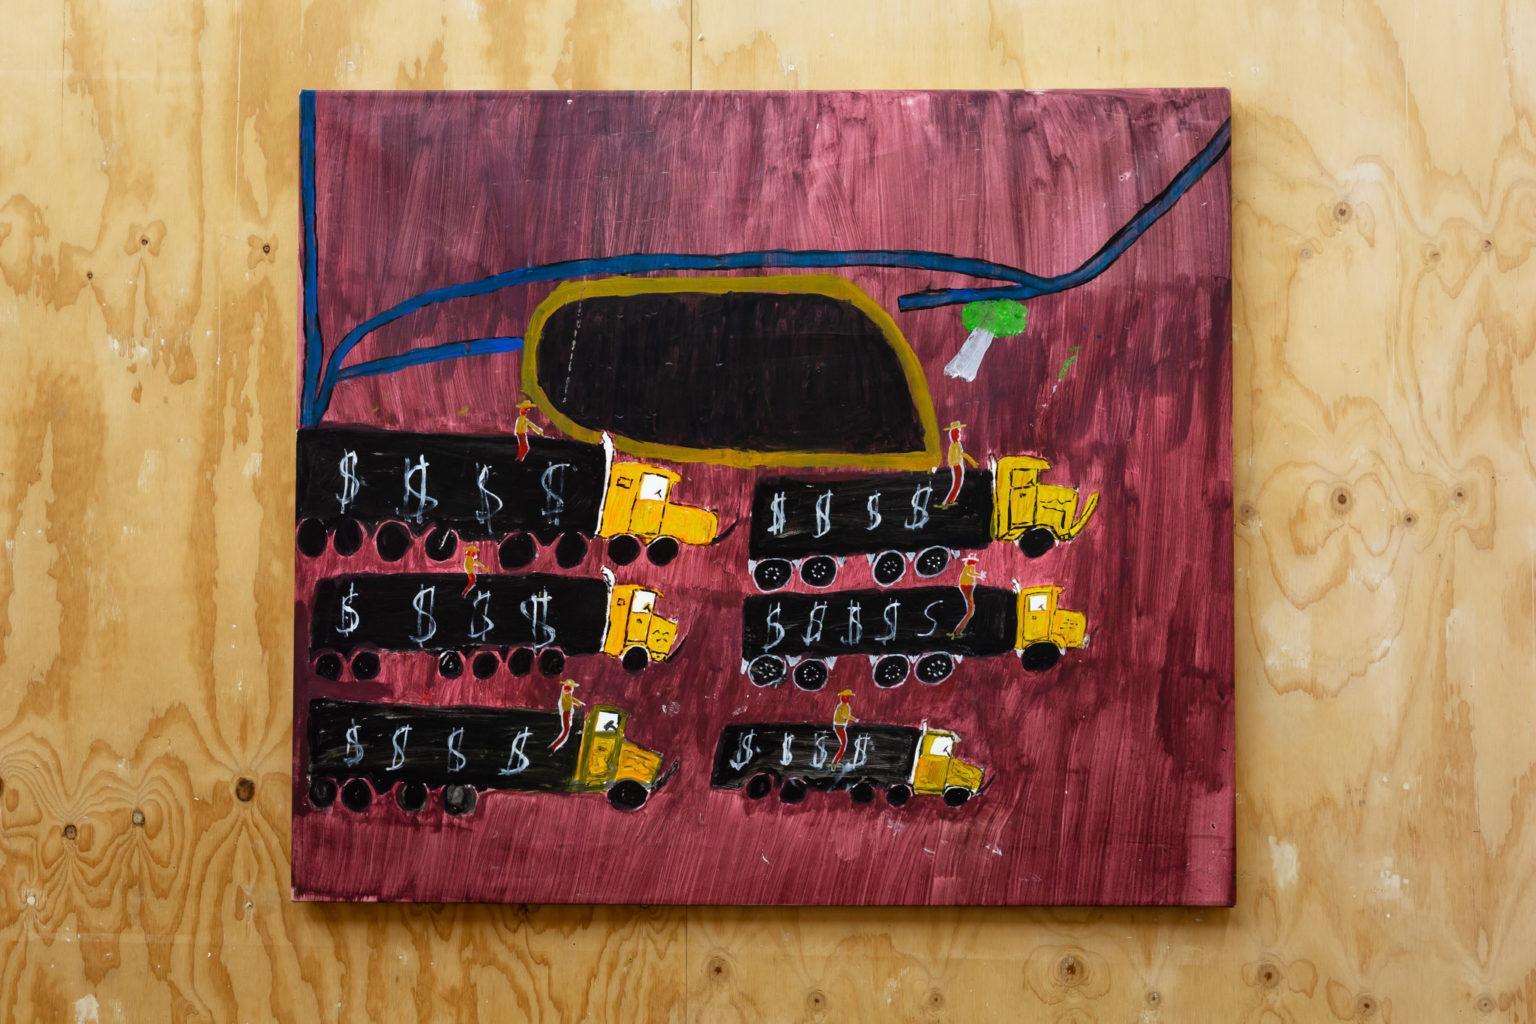 ArtSpace_IdeasPlatforms_26_09_18_Credit_Jacquie_Manning--10